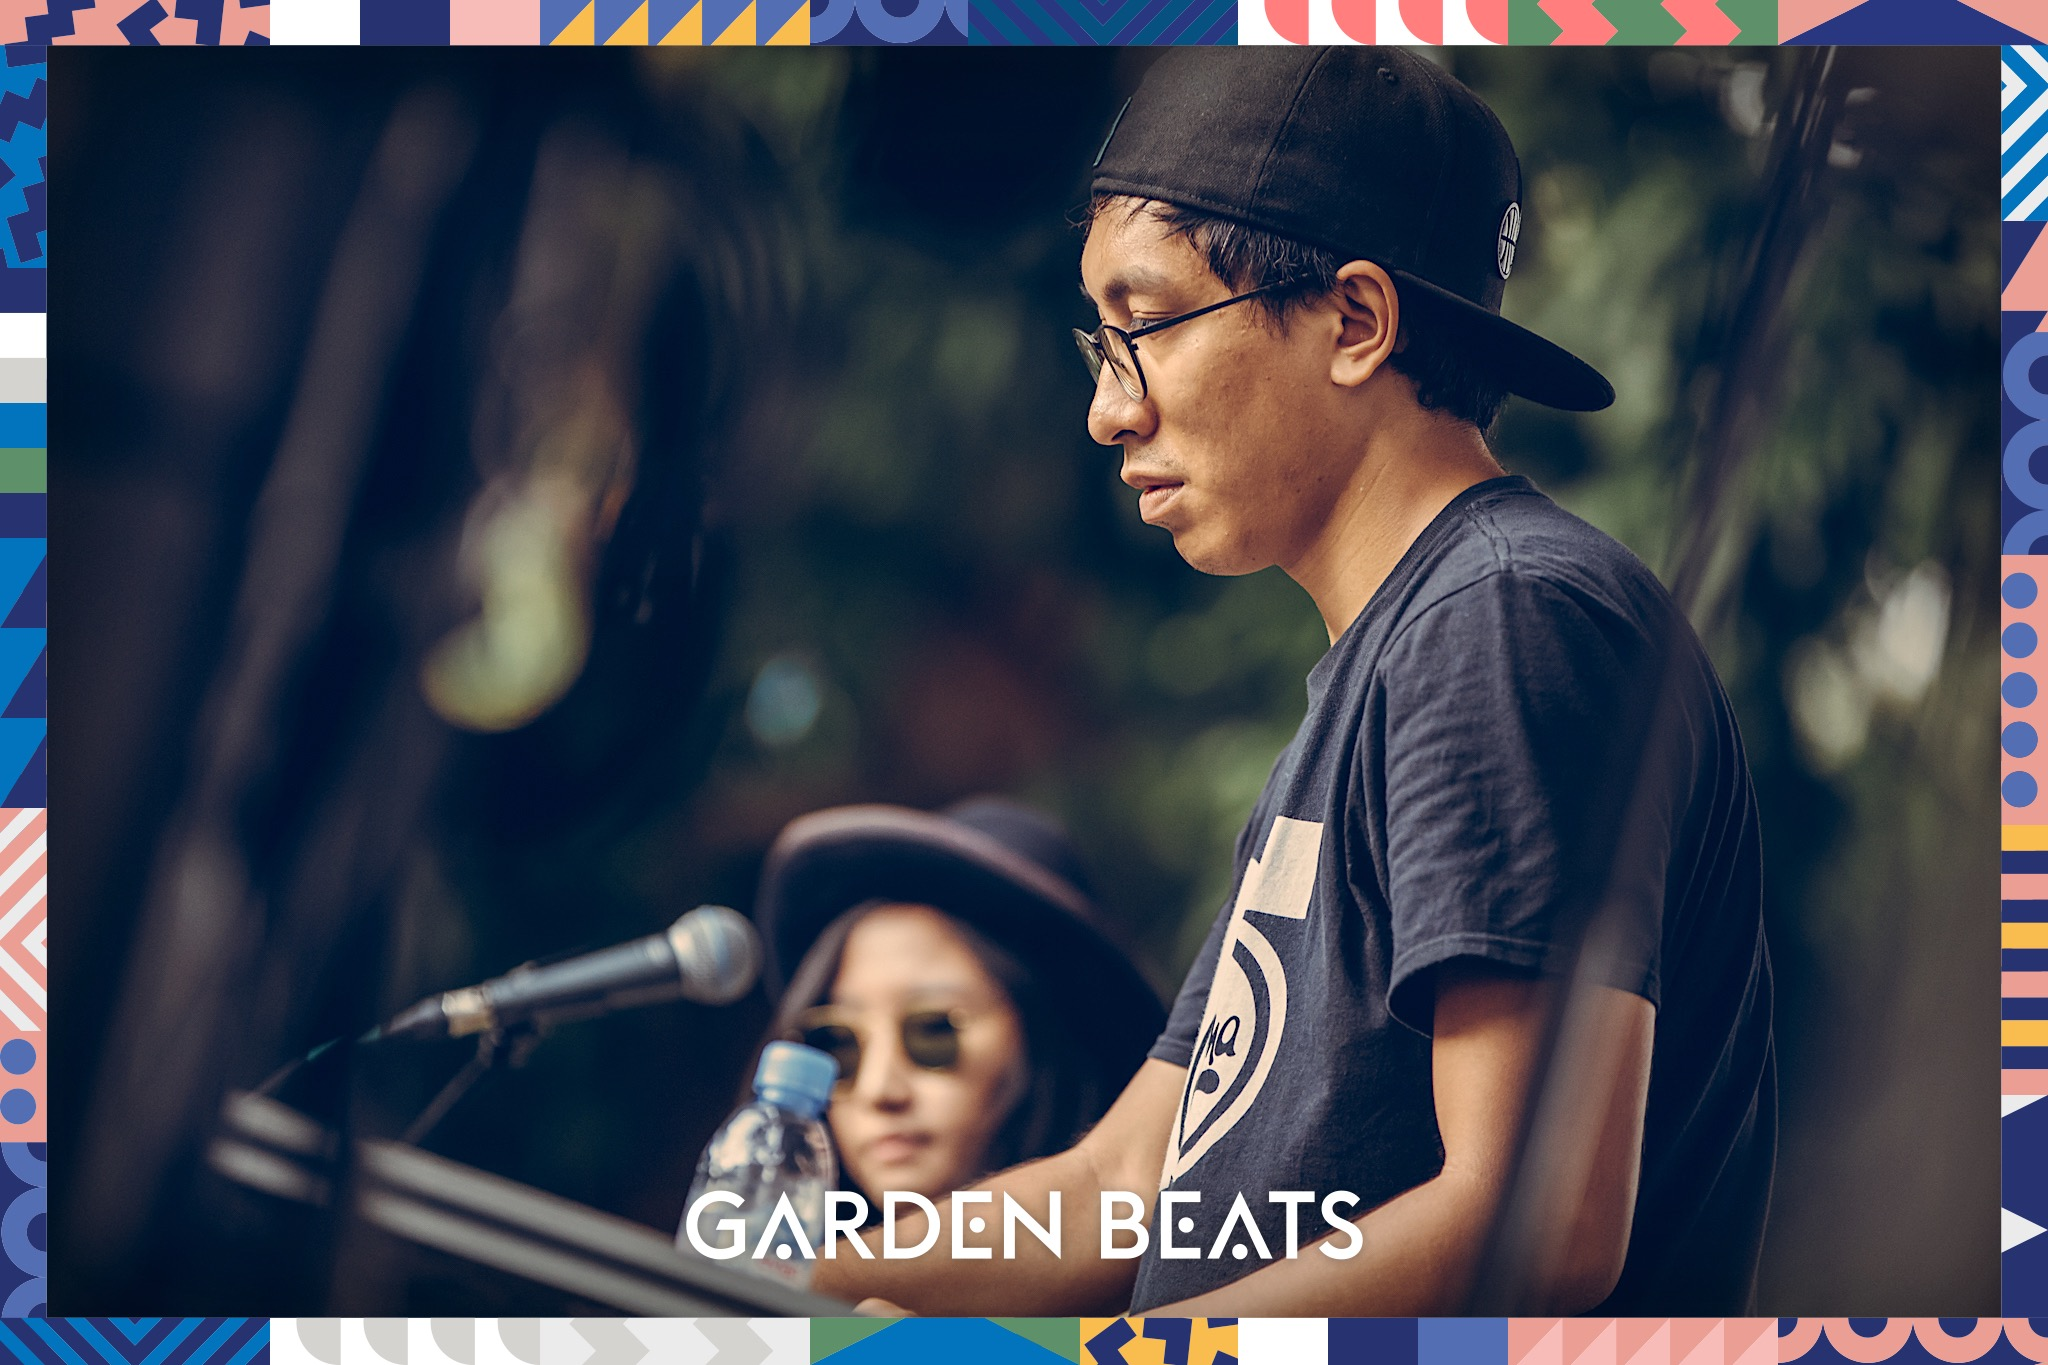 03032018_GardenBeats_Colossal410_Watermarked.jpg